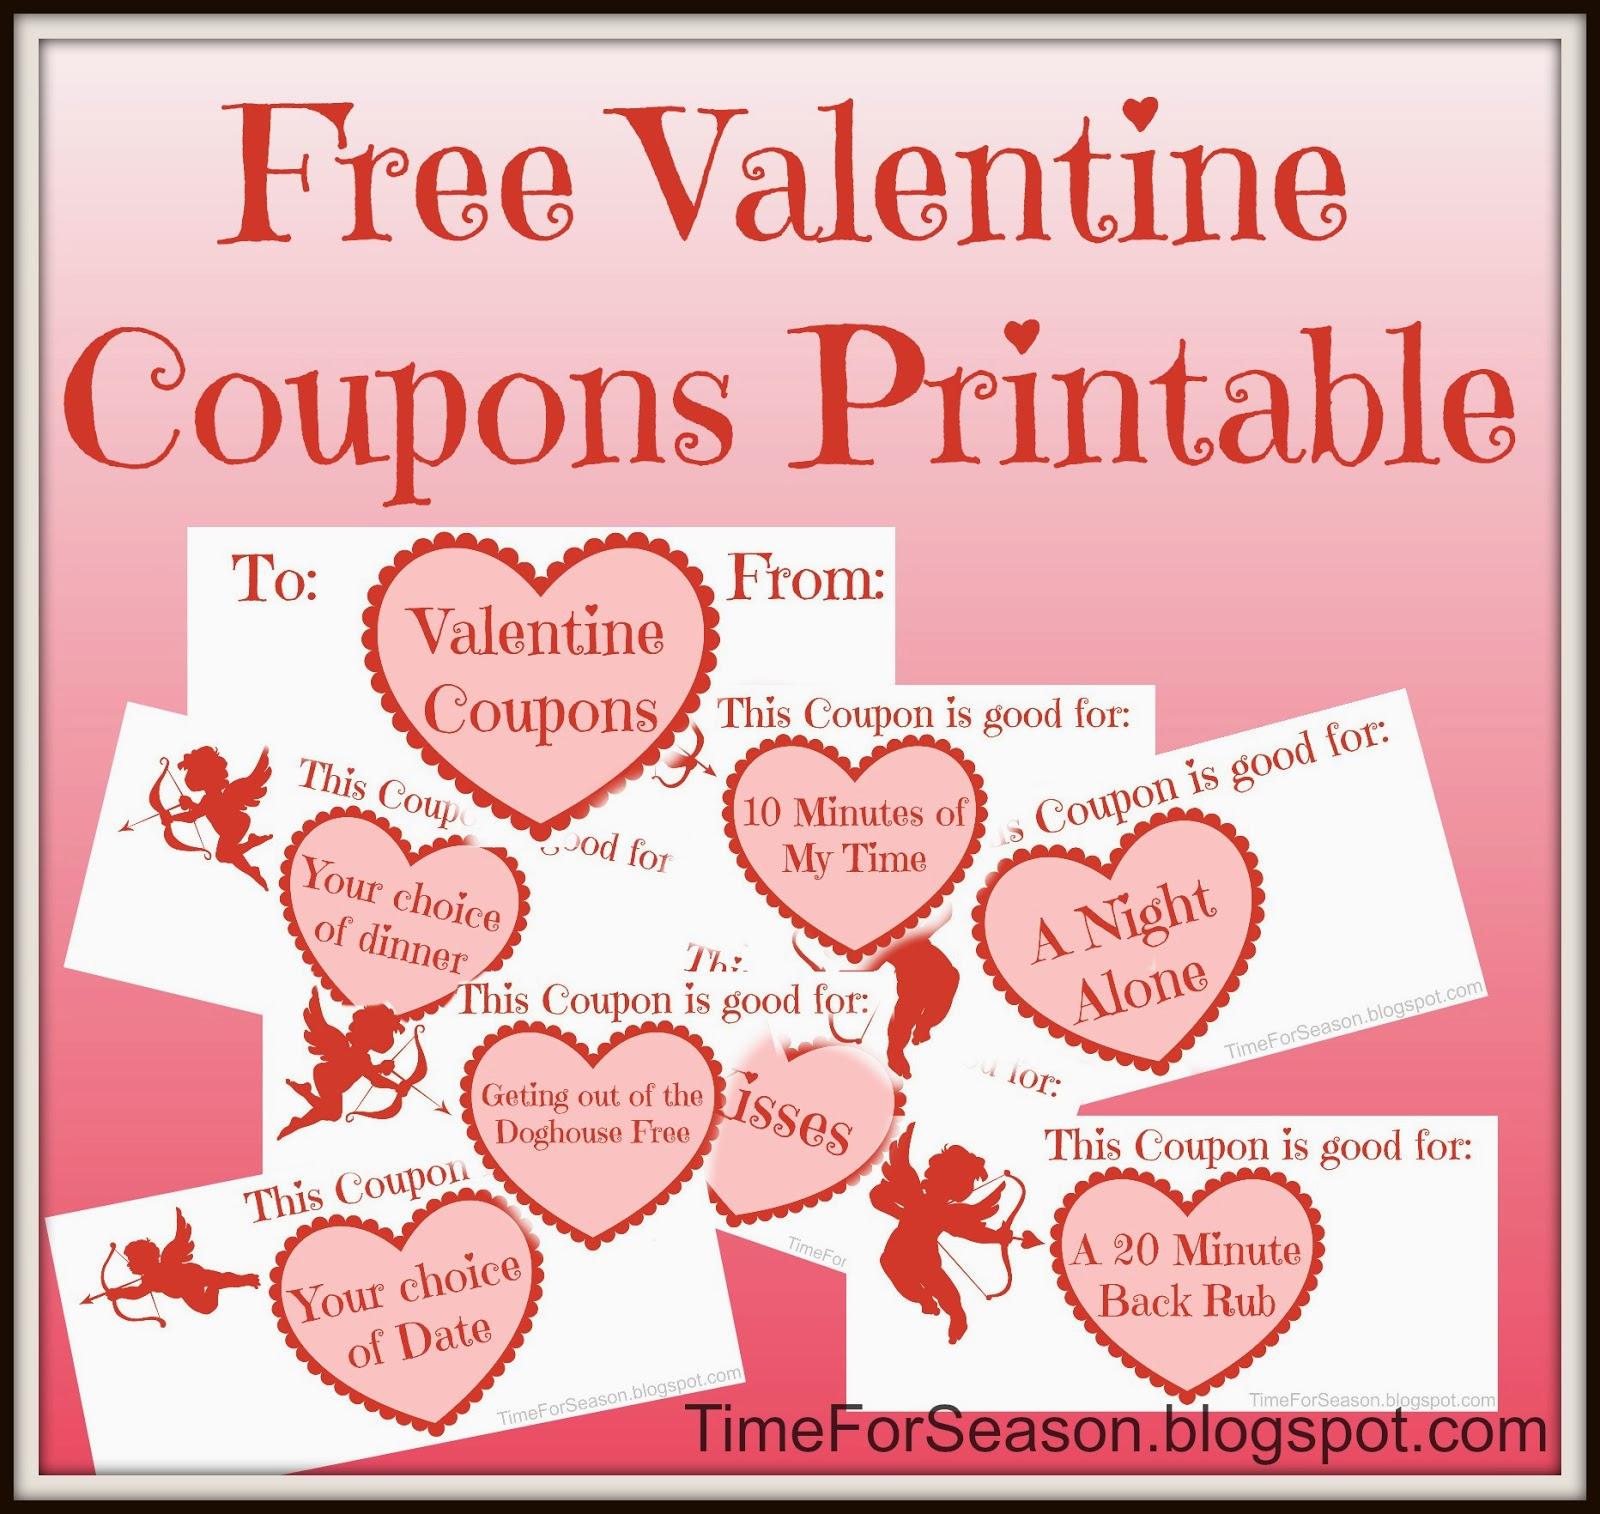 Free coupon downloads under. Fontanacountryinn. Com.